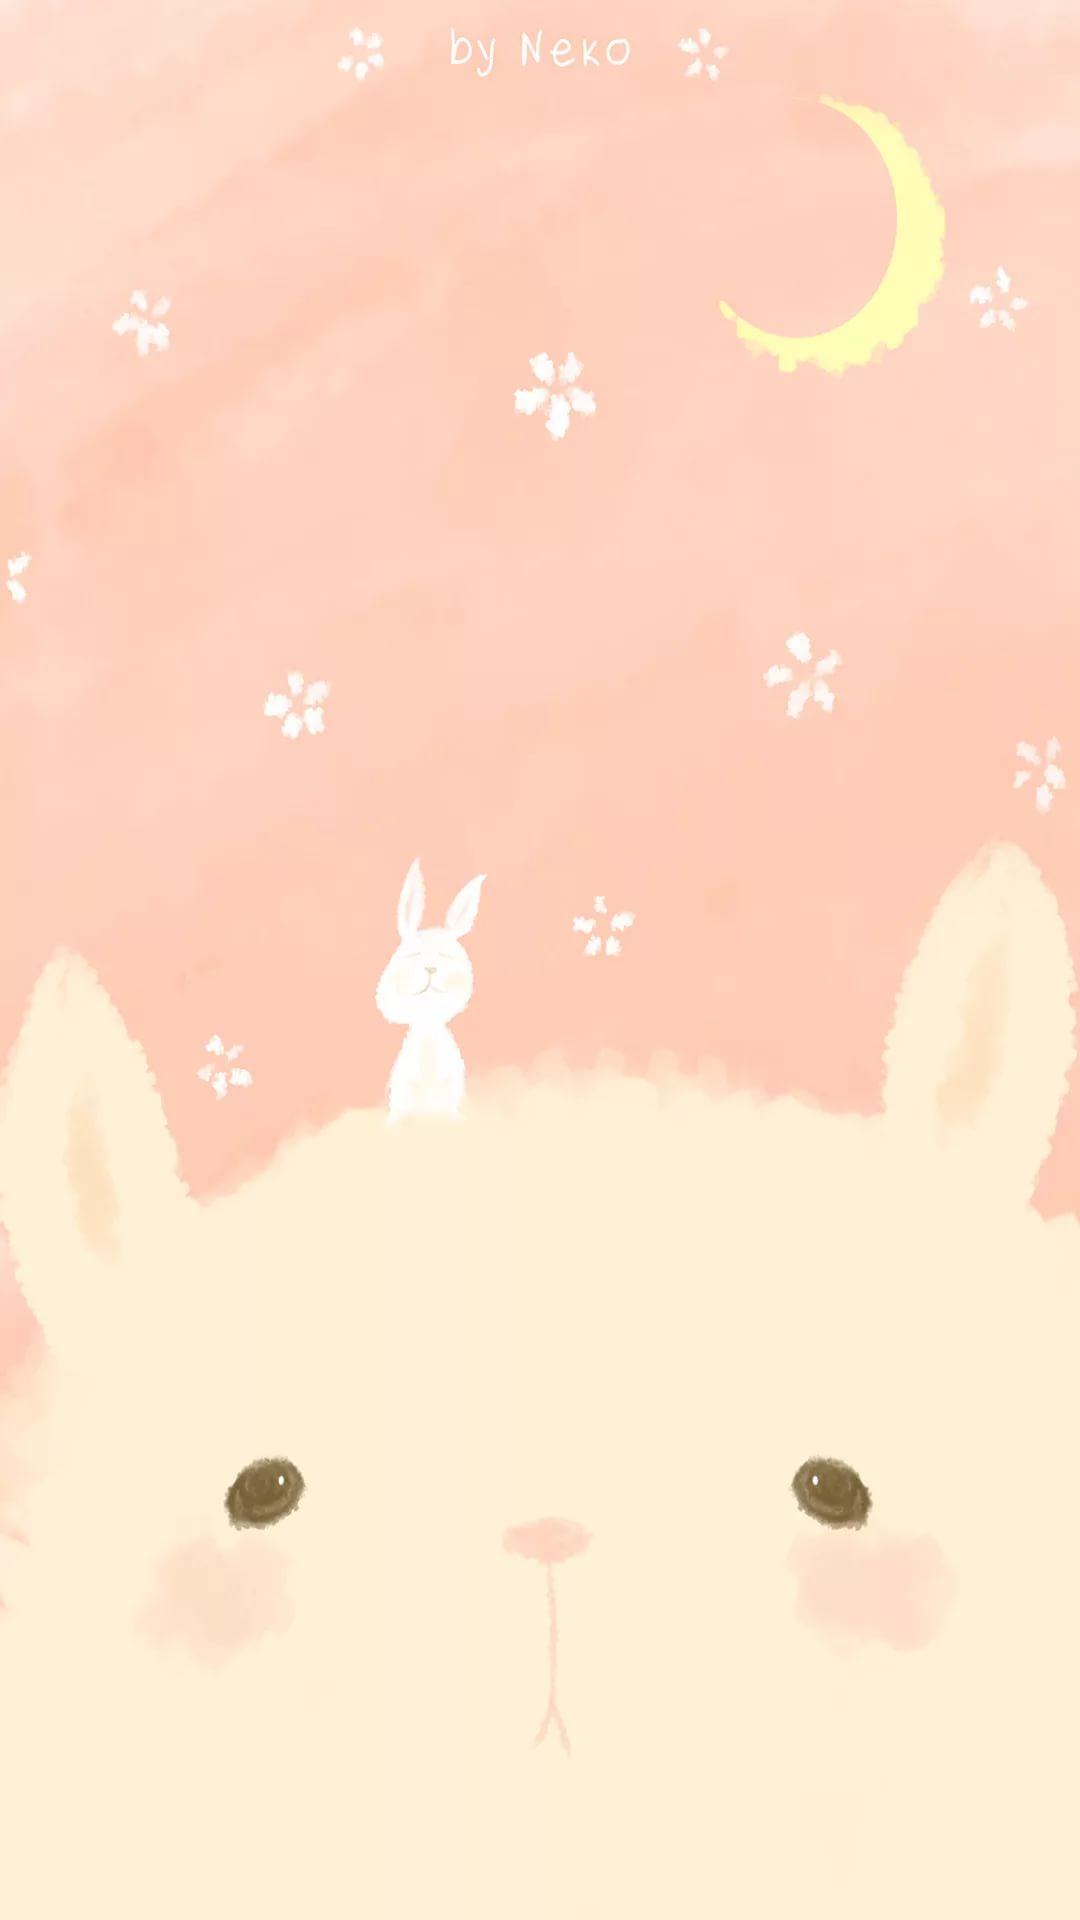 Cute iPhone wallpaper